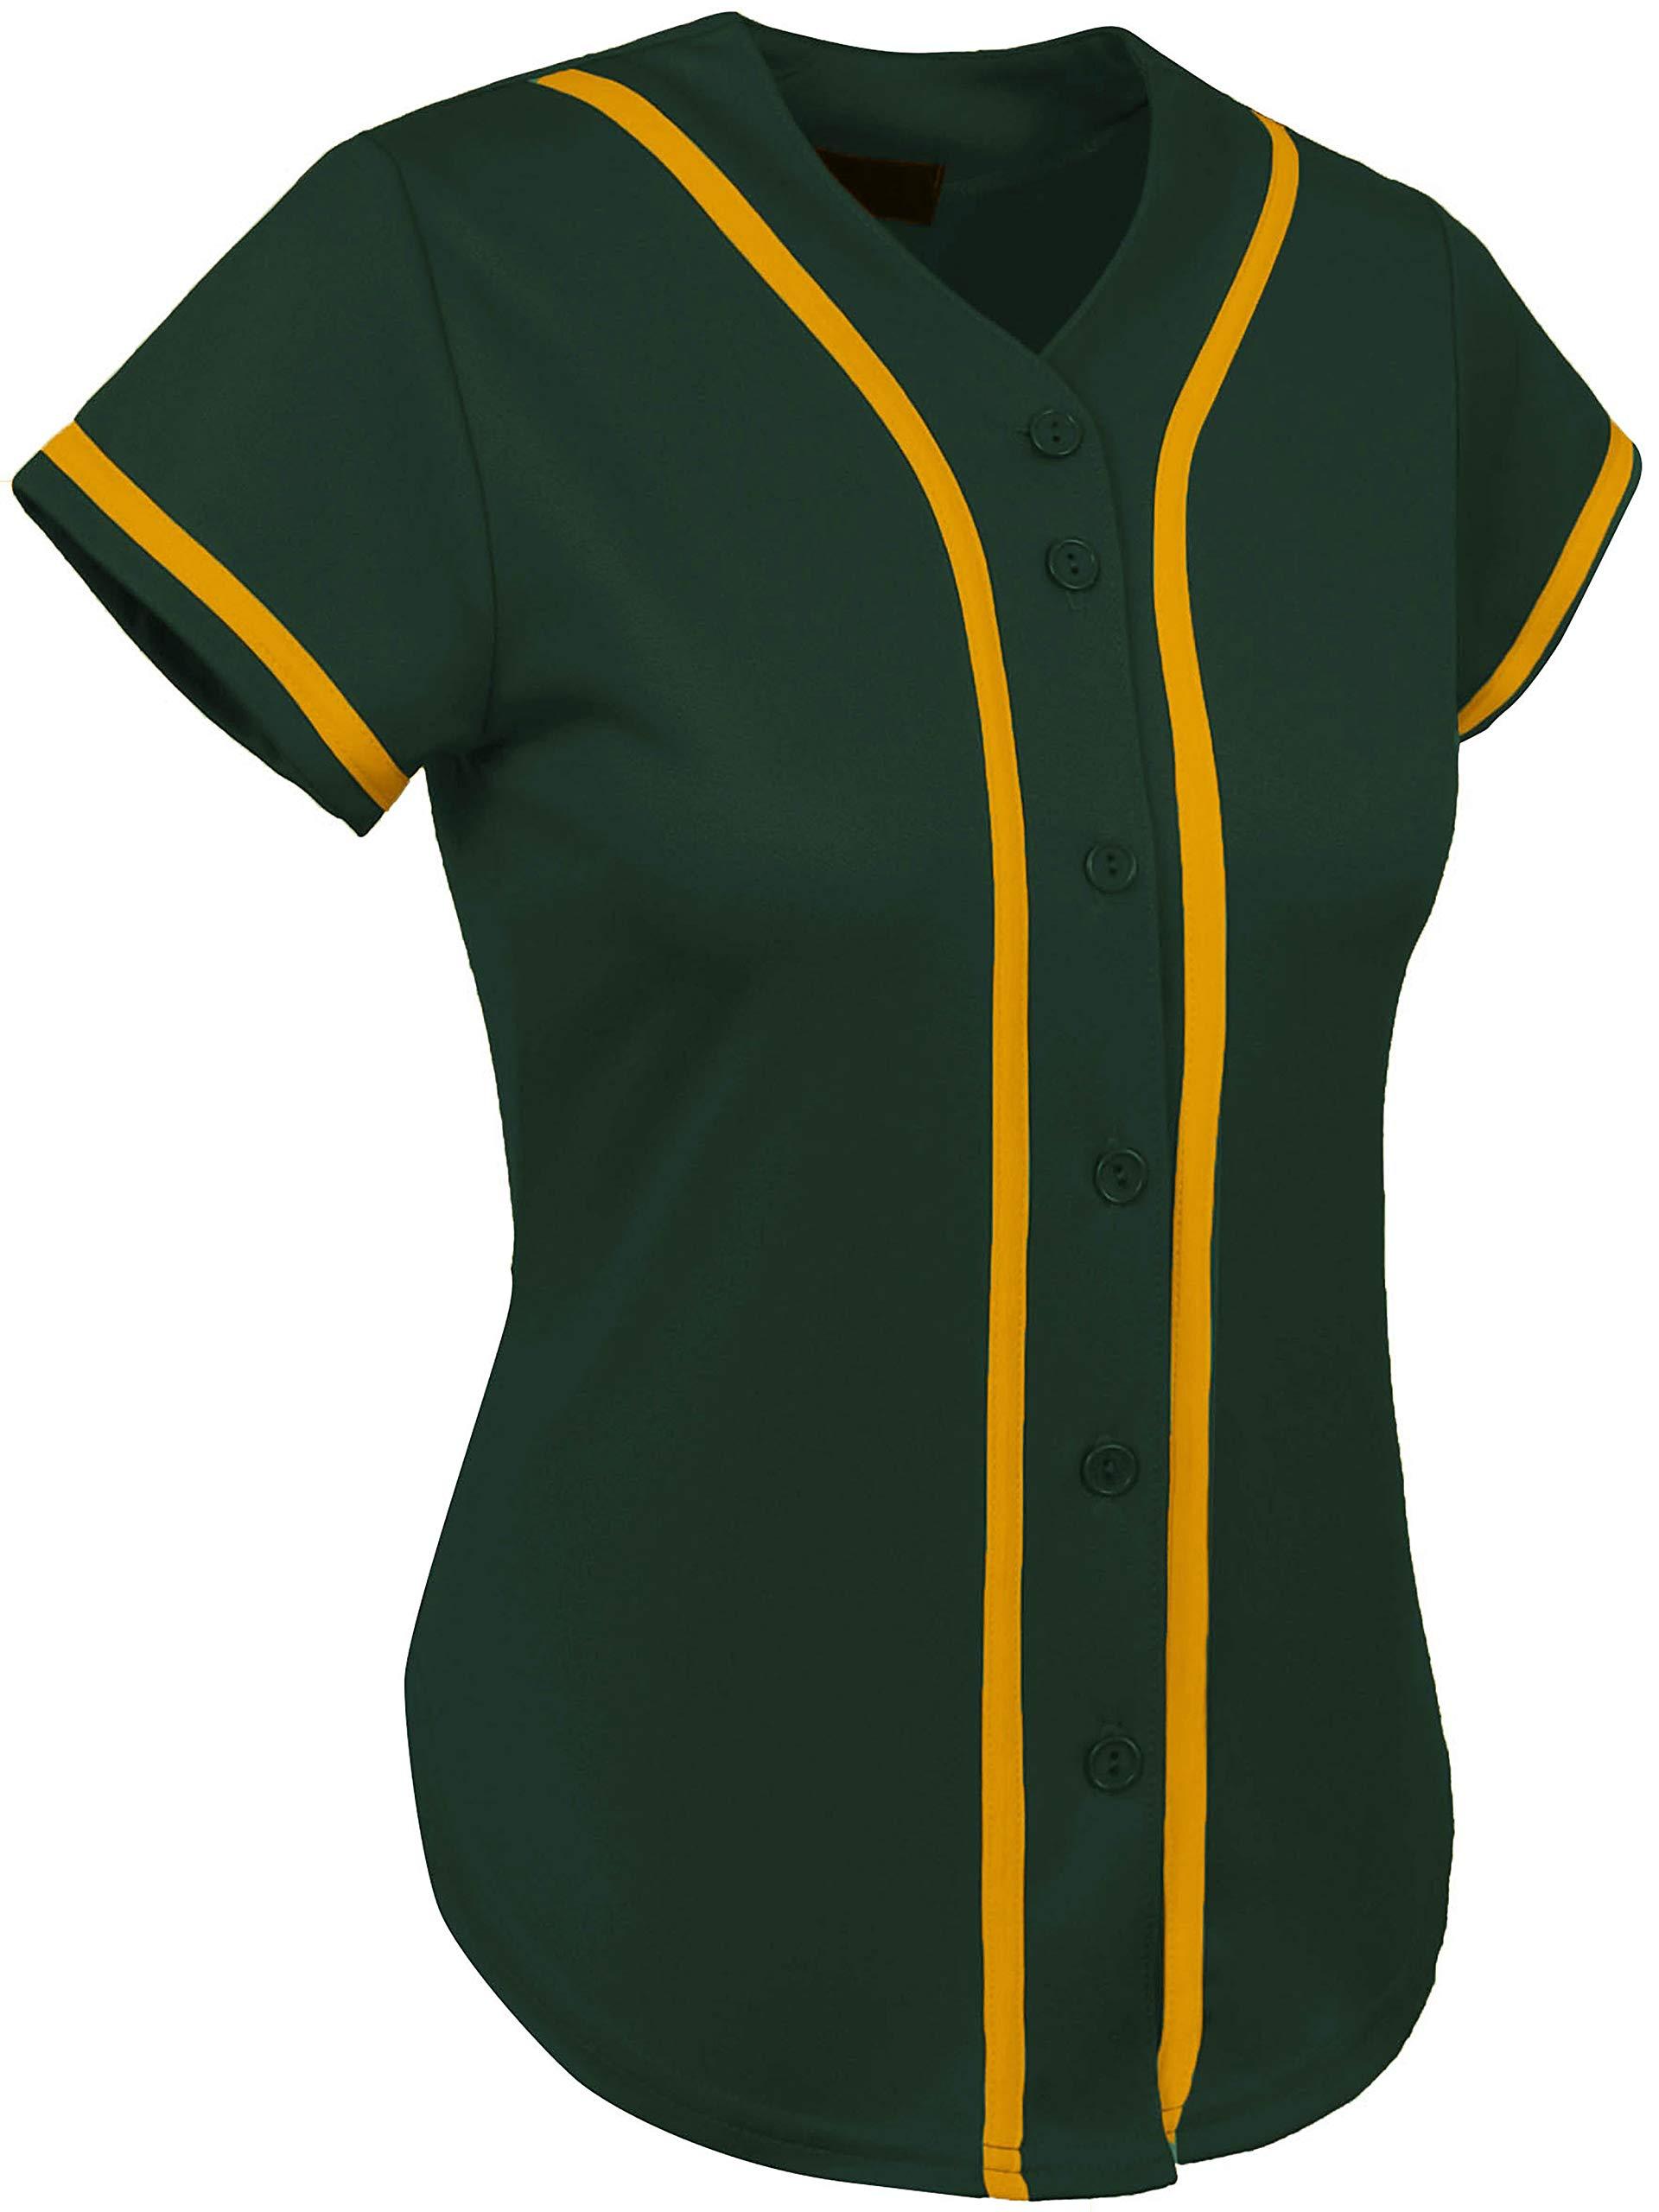 Ma Croix Womens Premium Baseball Jersey Active Button Shirt Team Uniform (2X-Large, 3up01_Hunter Green/Gold) by Ma Croix